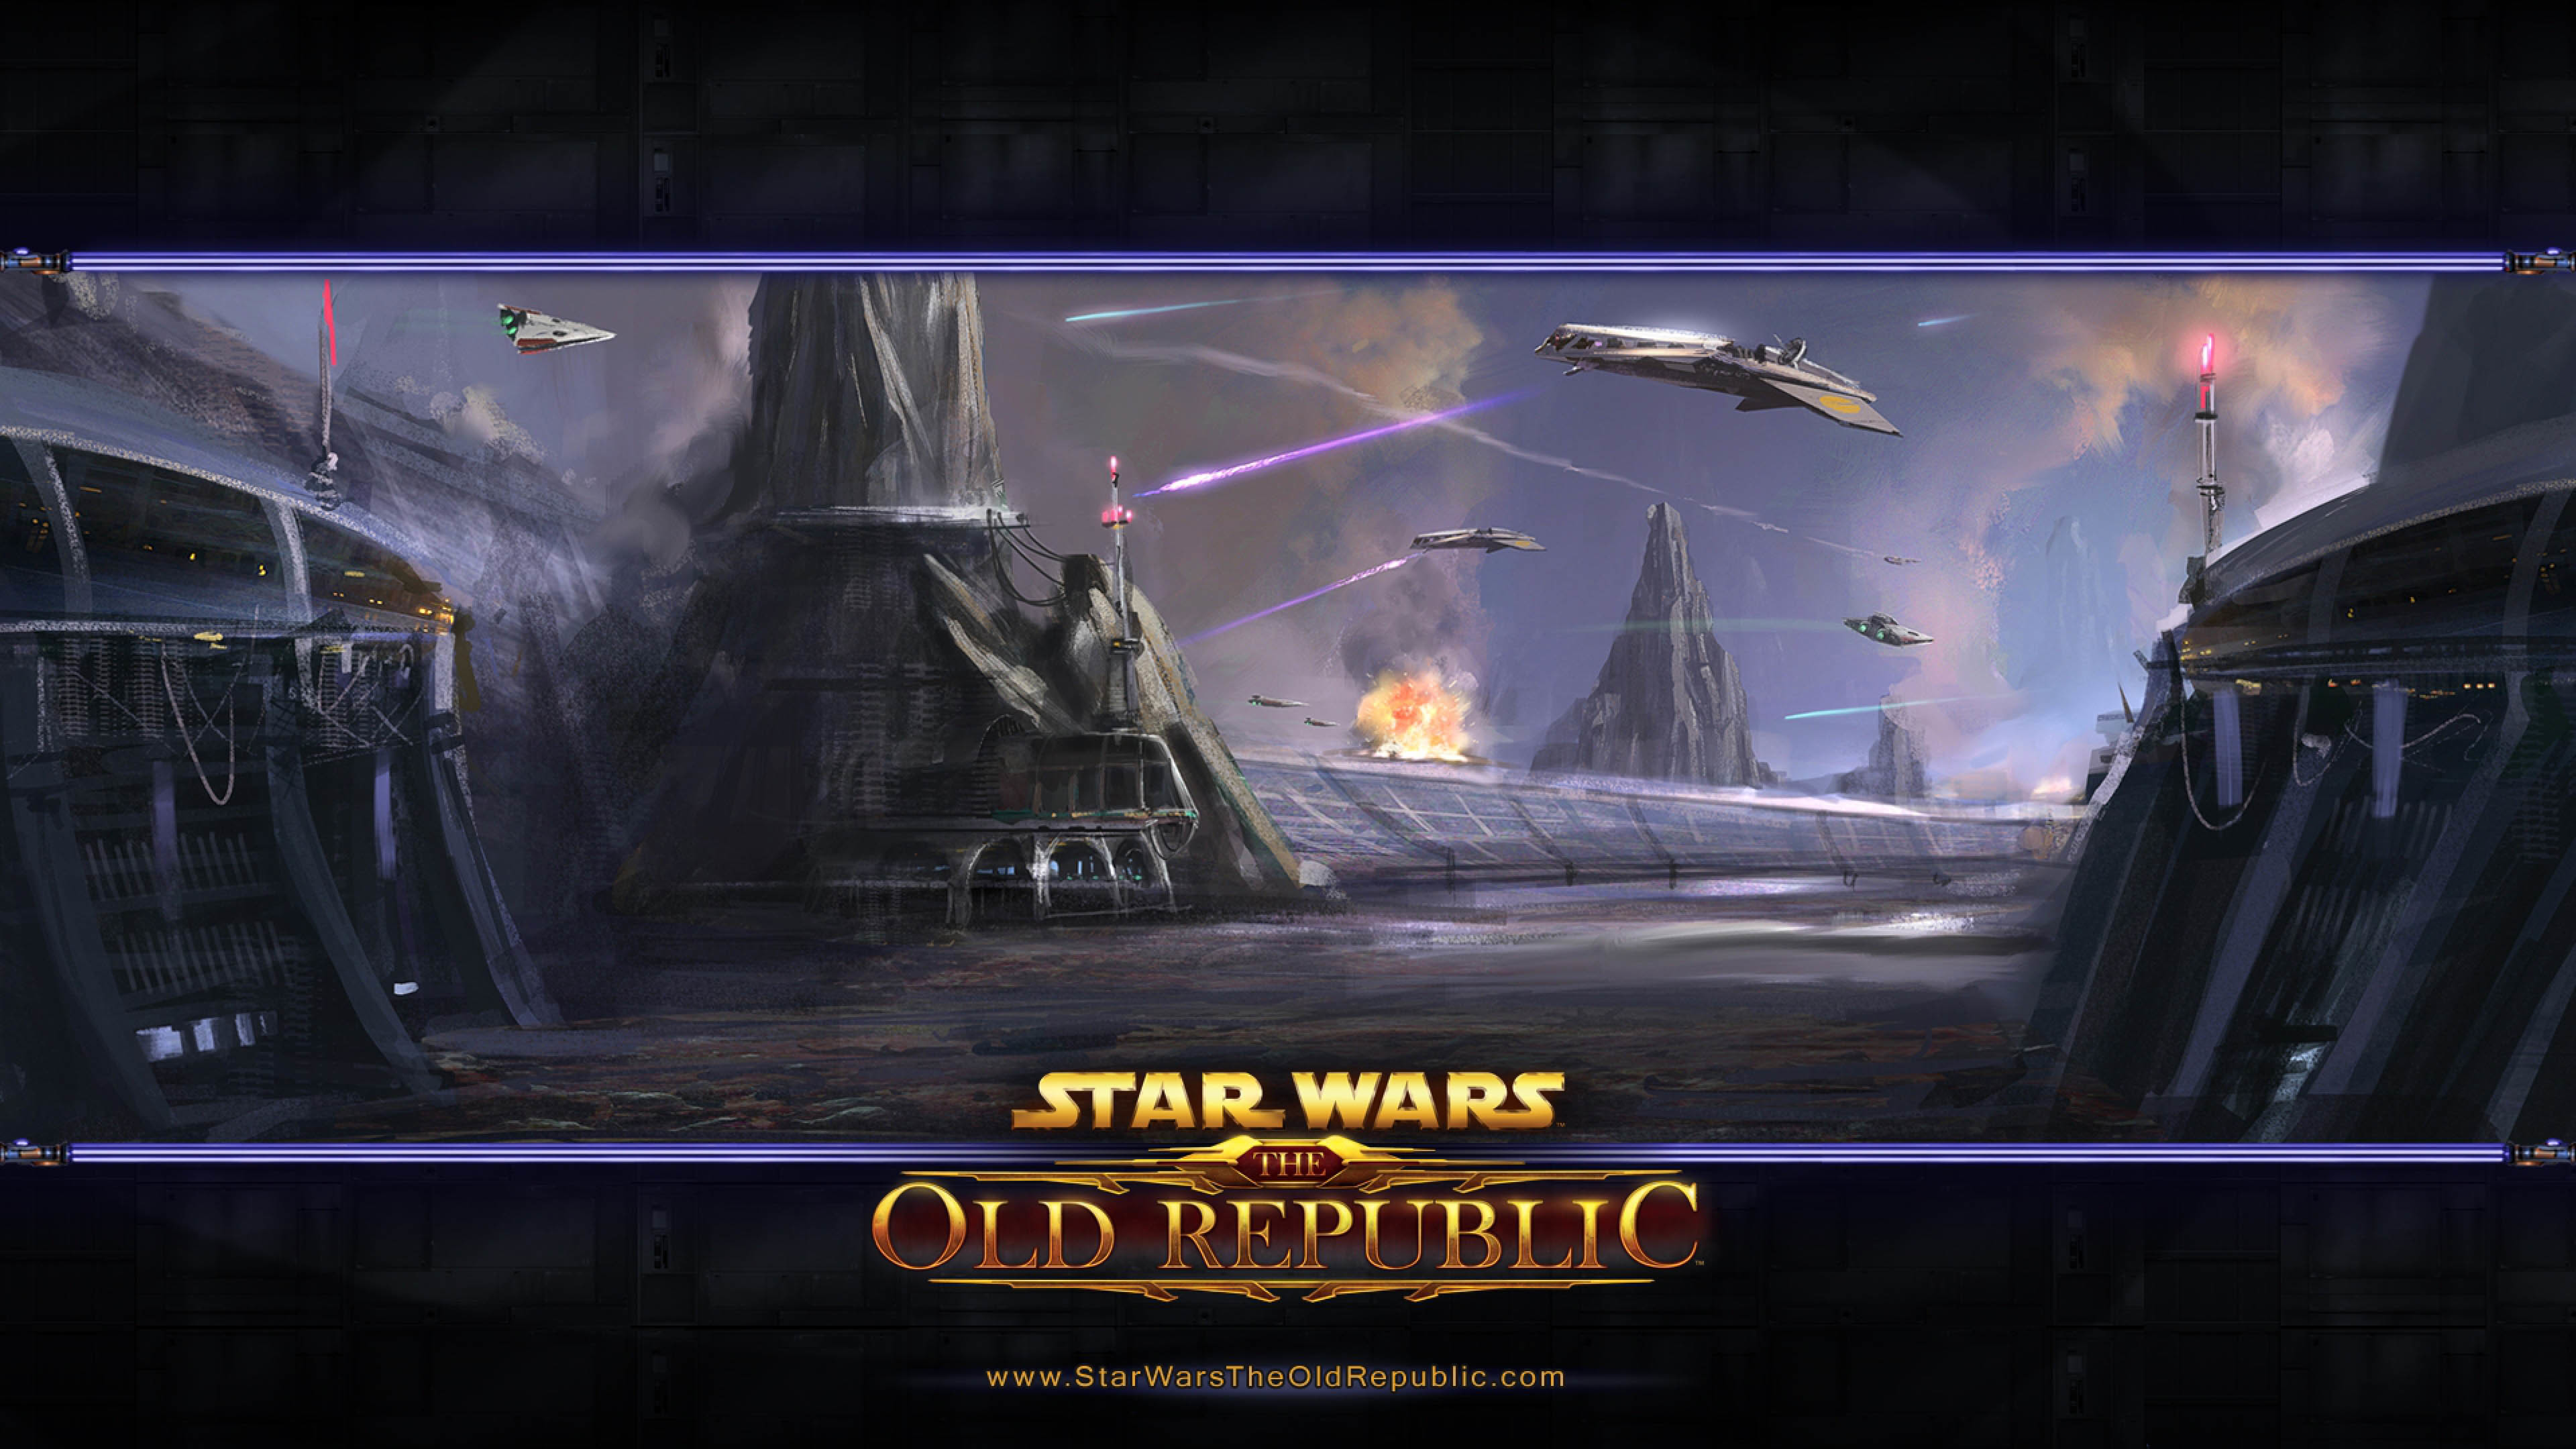 Star Wars: The Old Republic – Landscape Artwork wallpaper